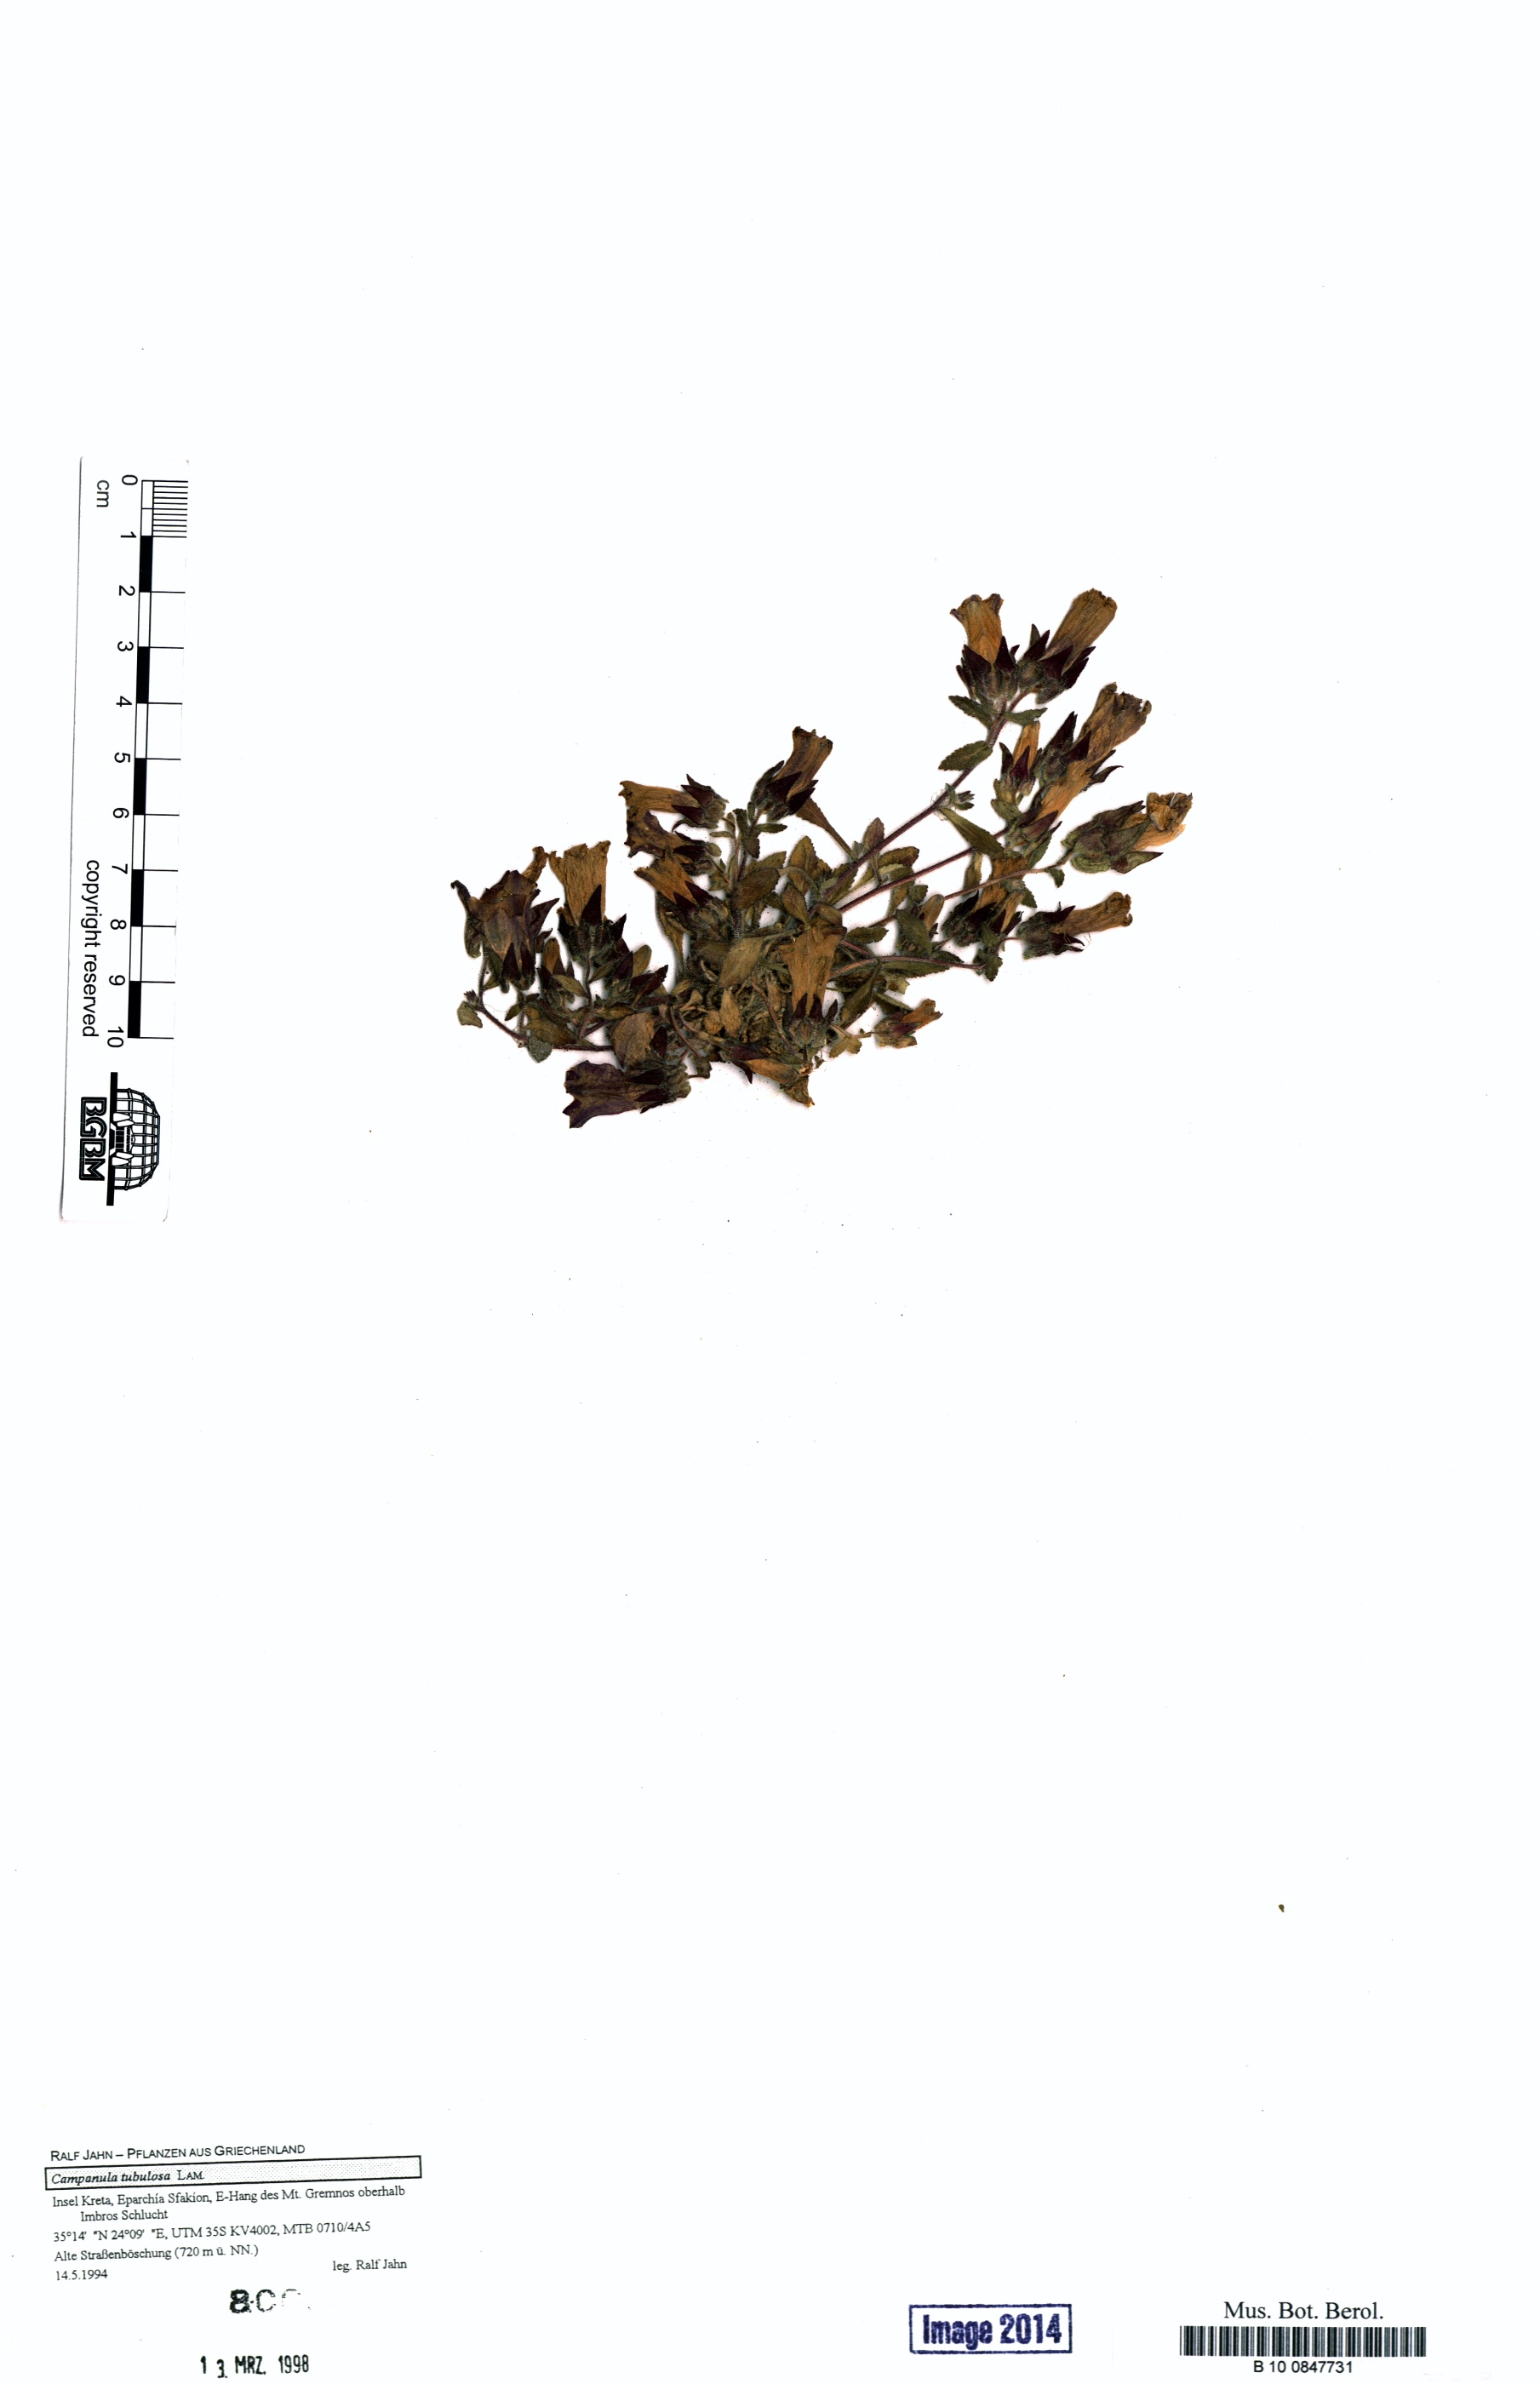 http://ww2.bgbm.org/herbarium/images/B/10/08/47/73/B_10_0847731.jpg